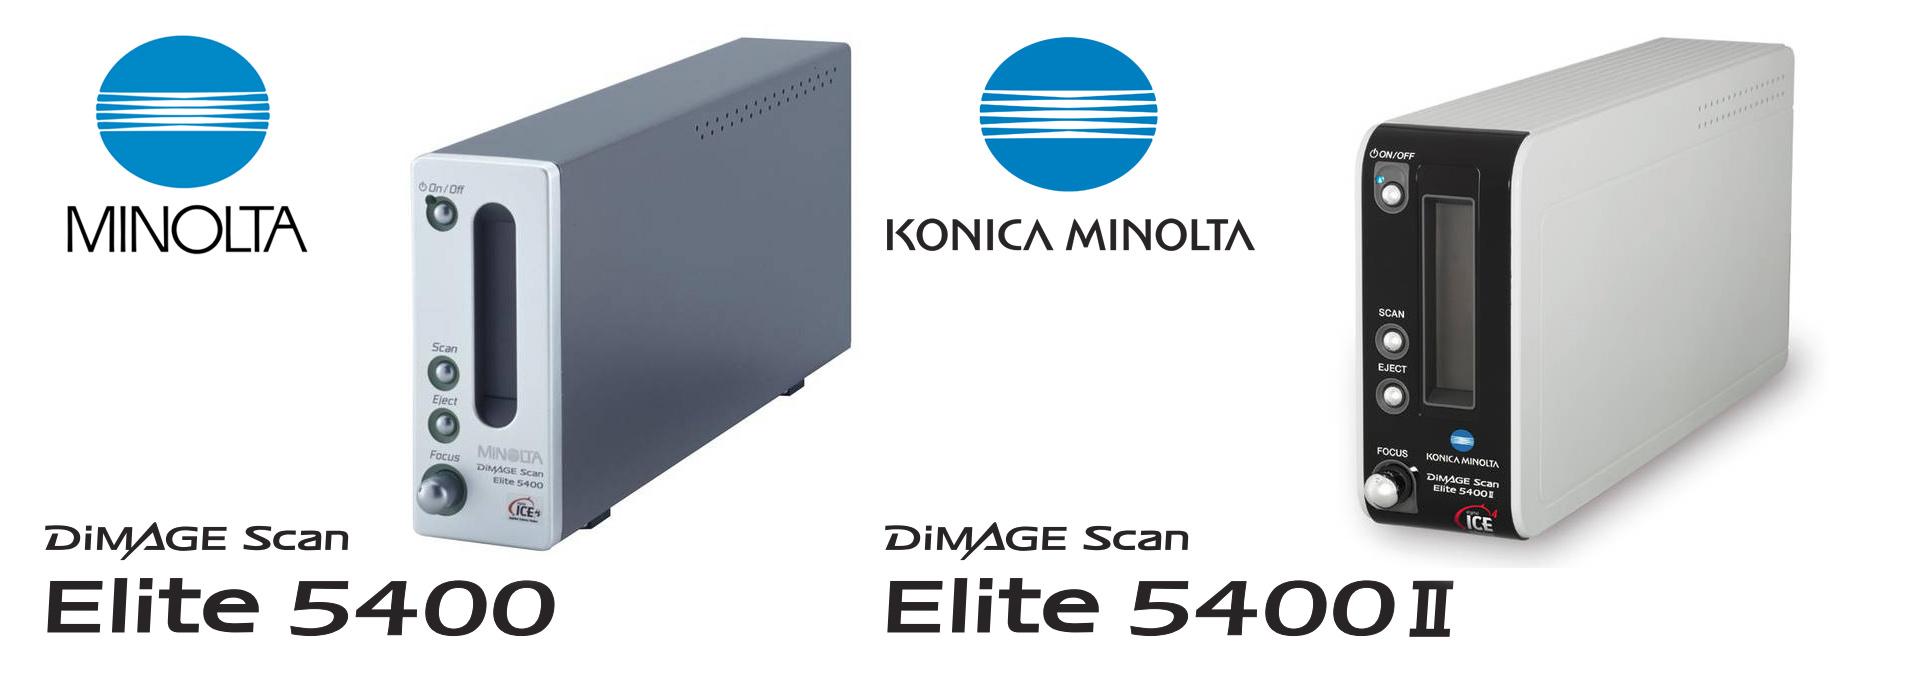 Dimage-5400-one-and-II.jpg